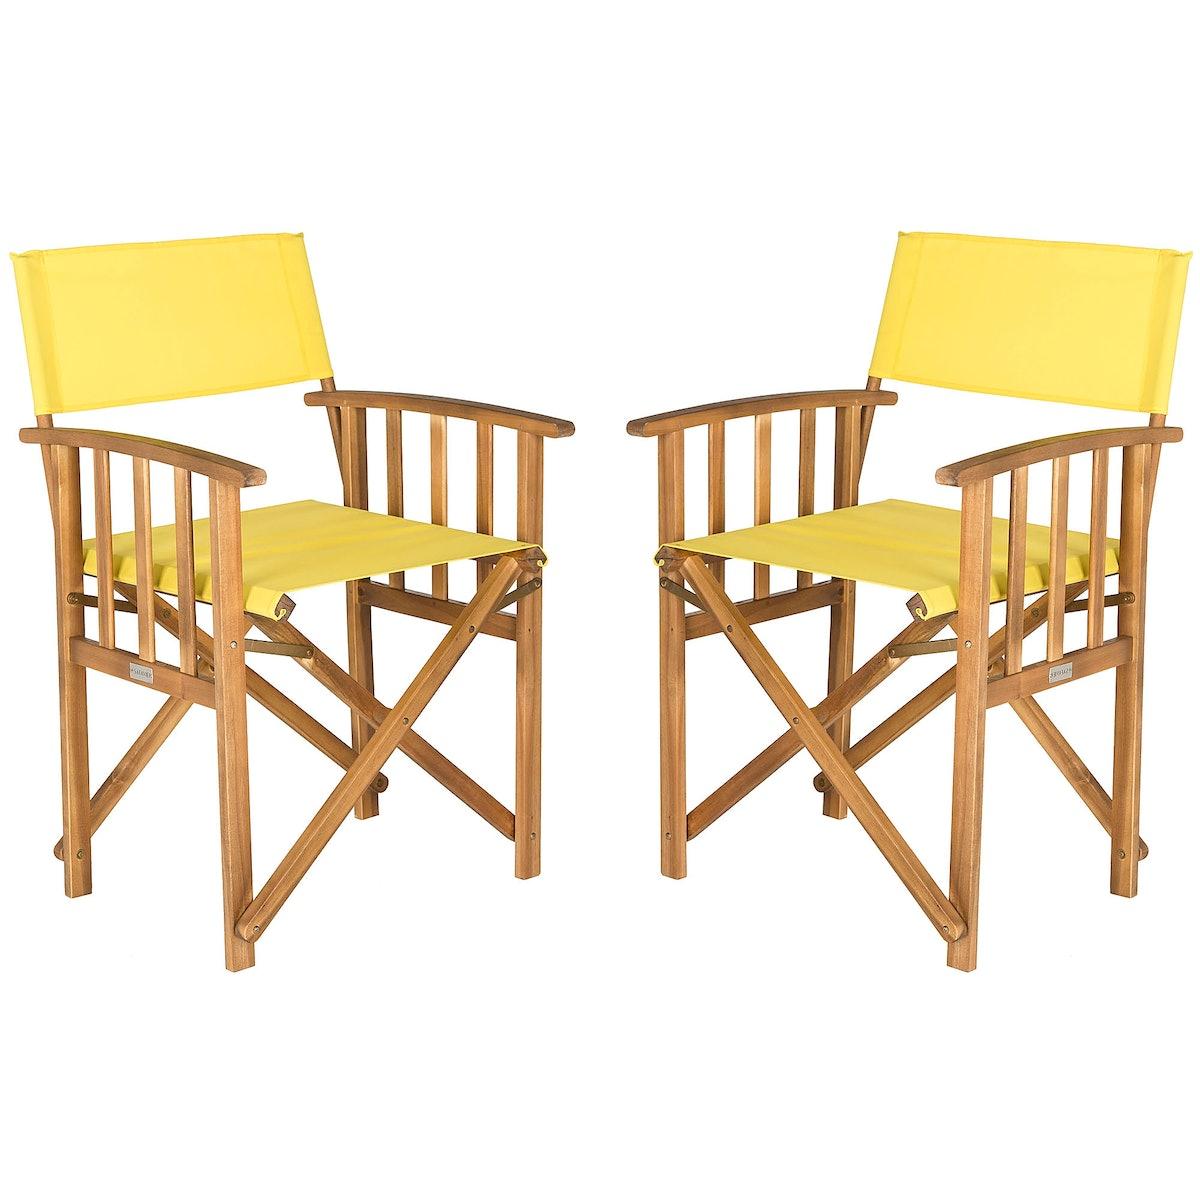 Safavieh Laguna Outdoor Director Chairs